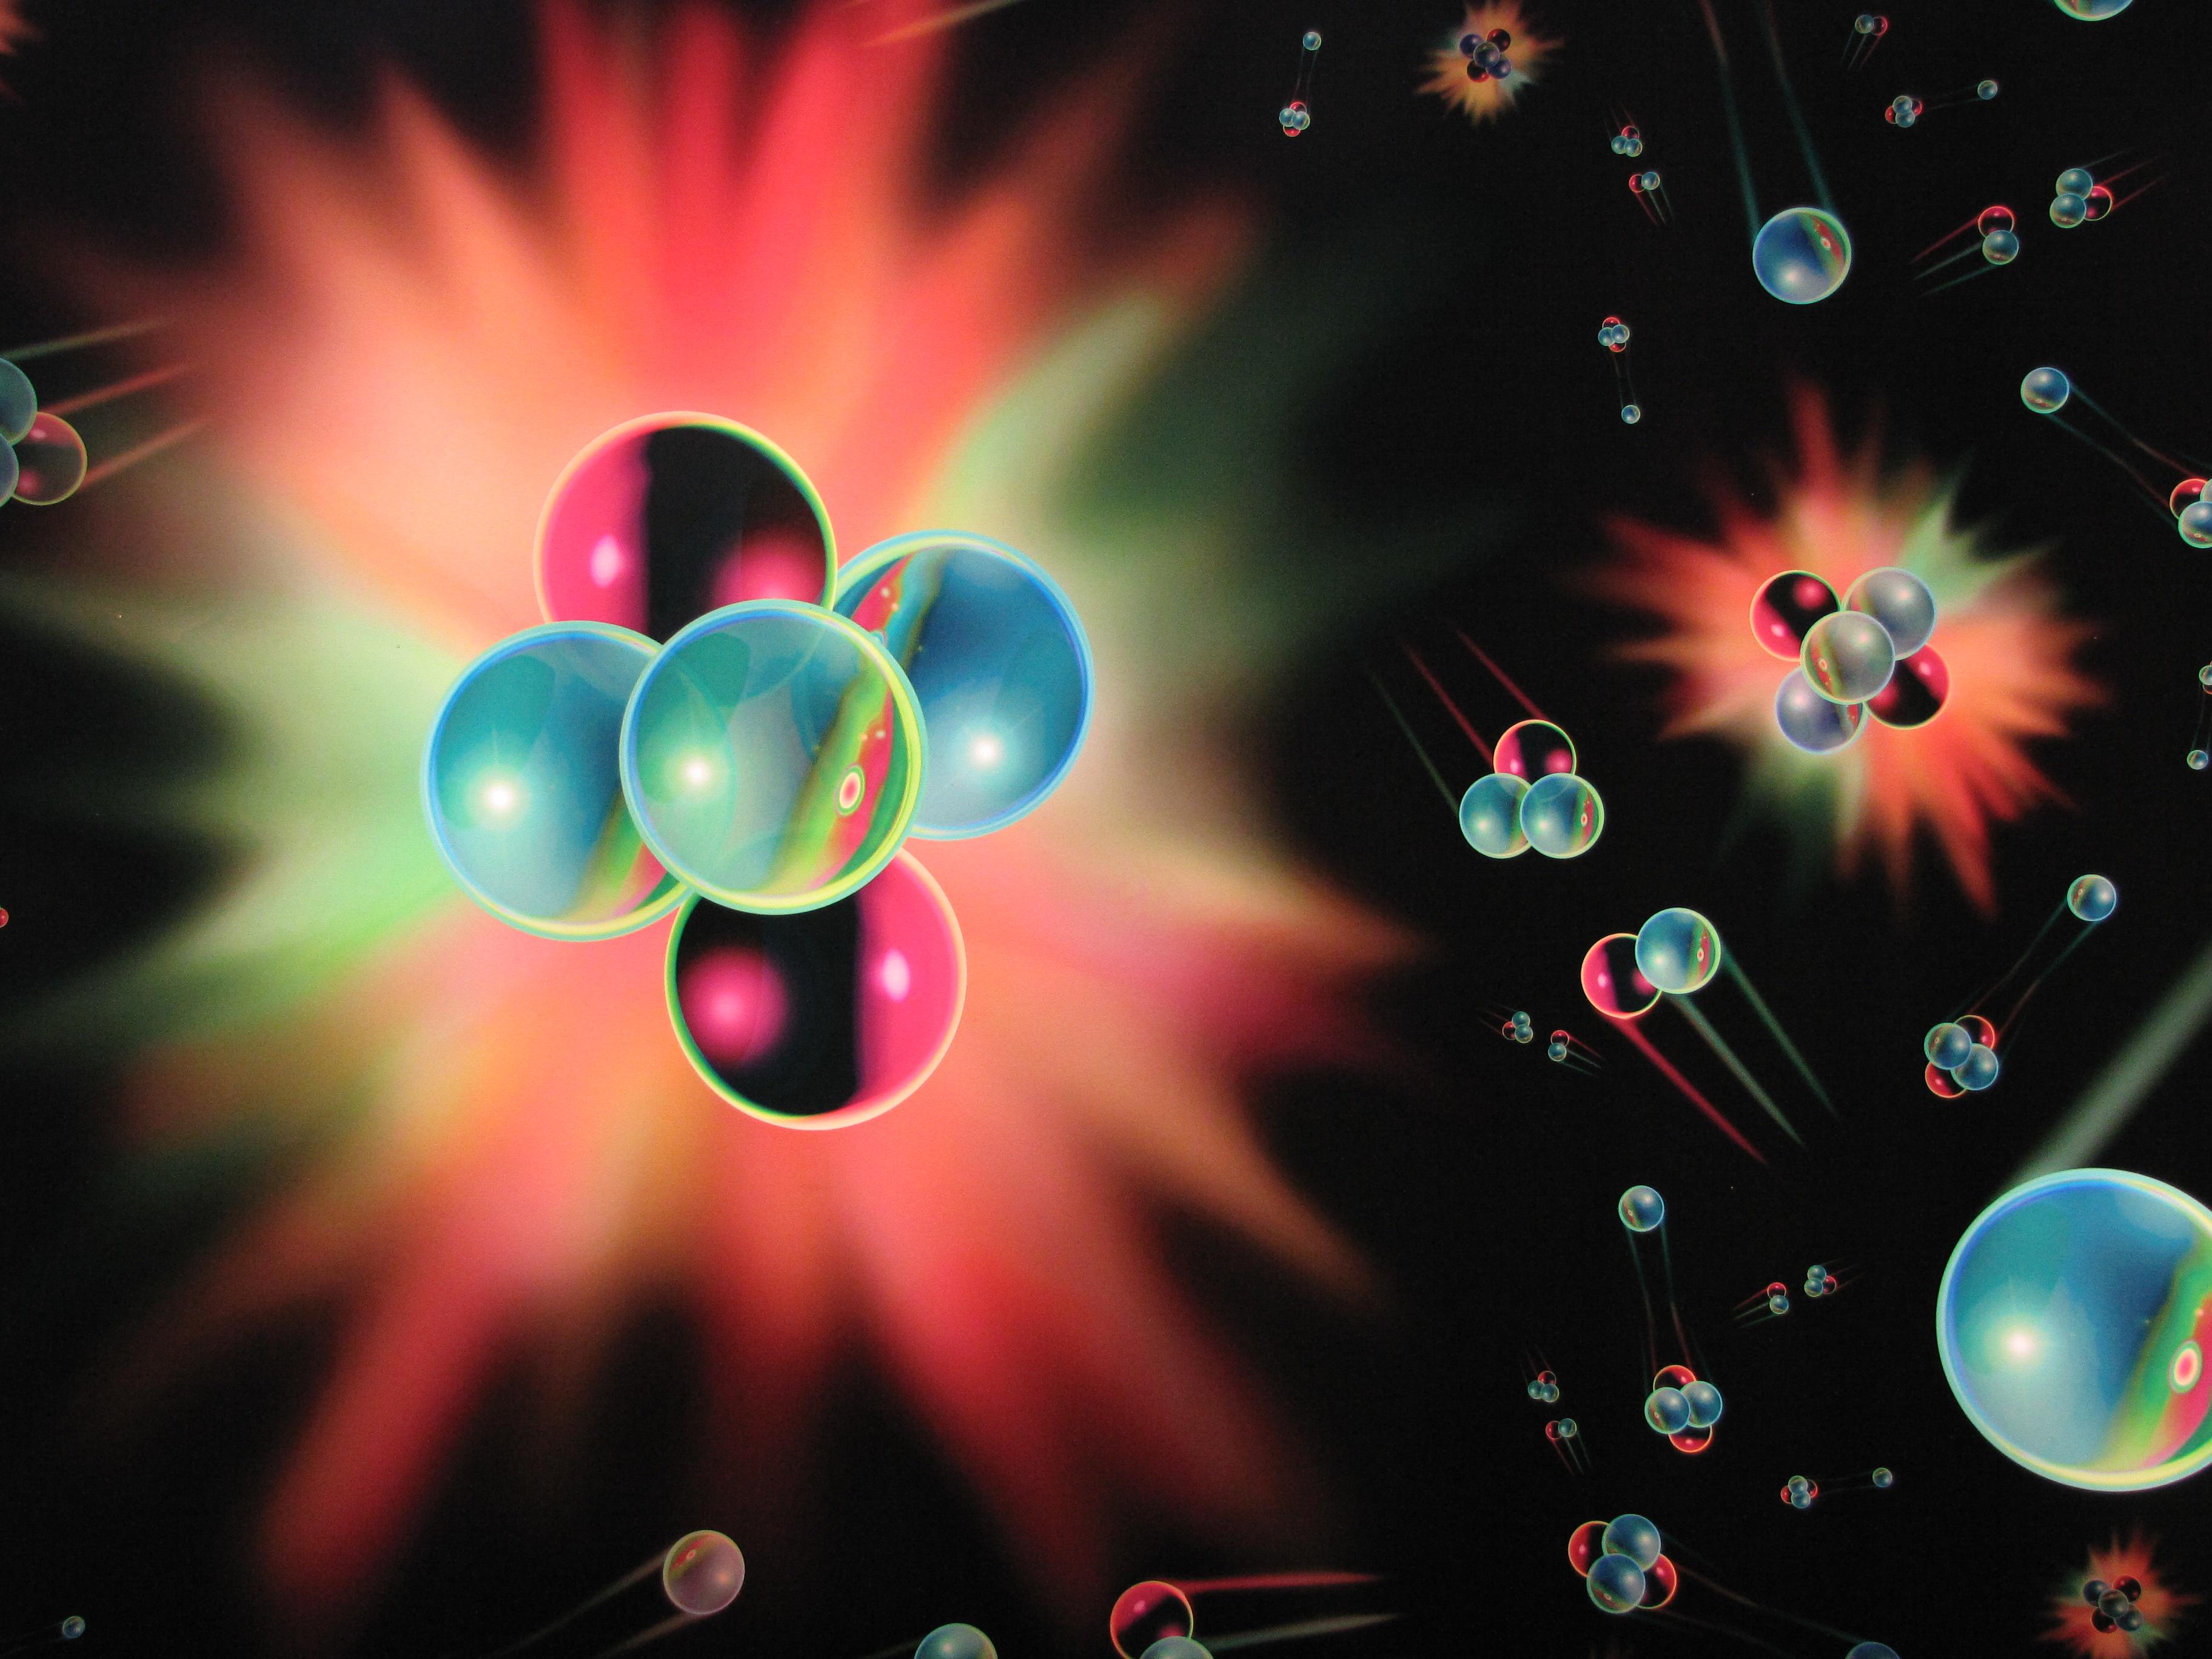 Jadrová fúzia